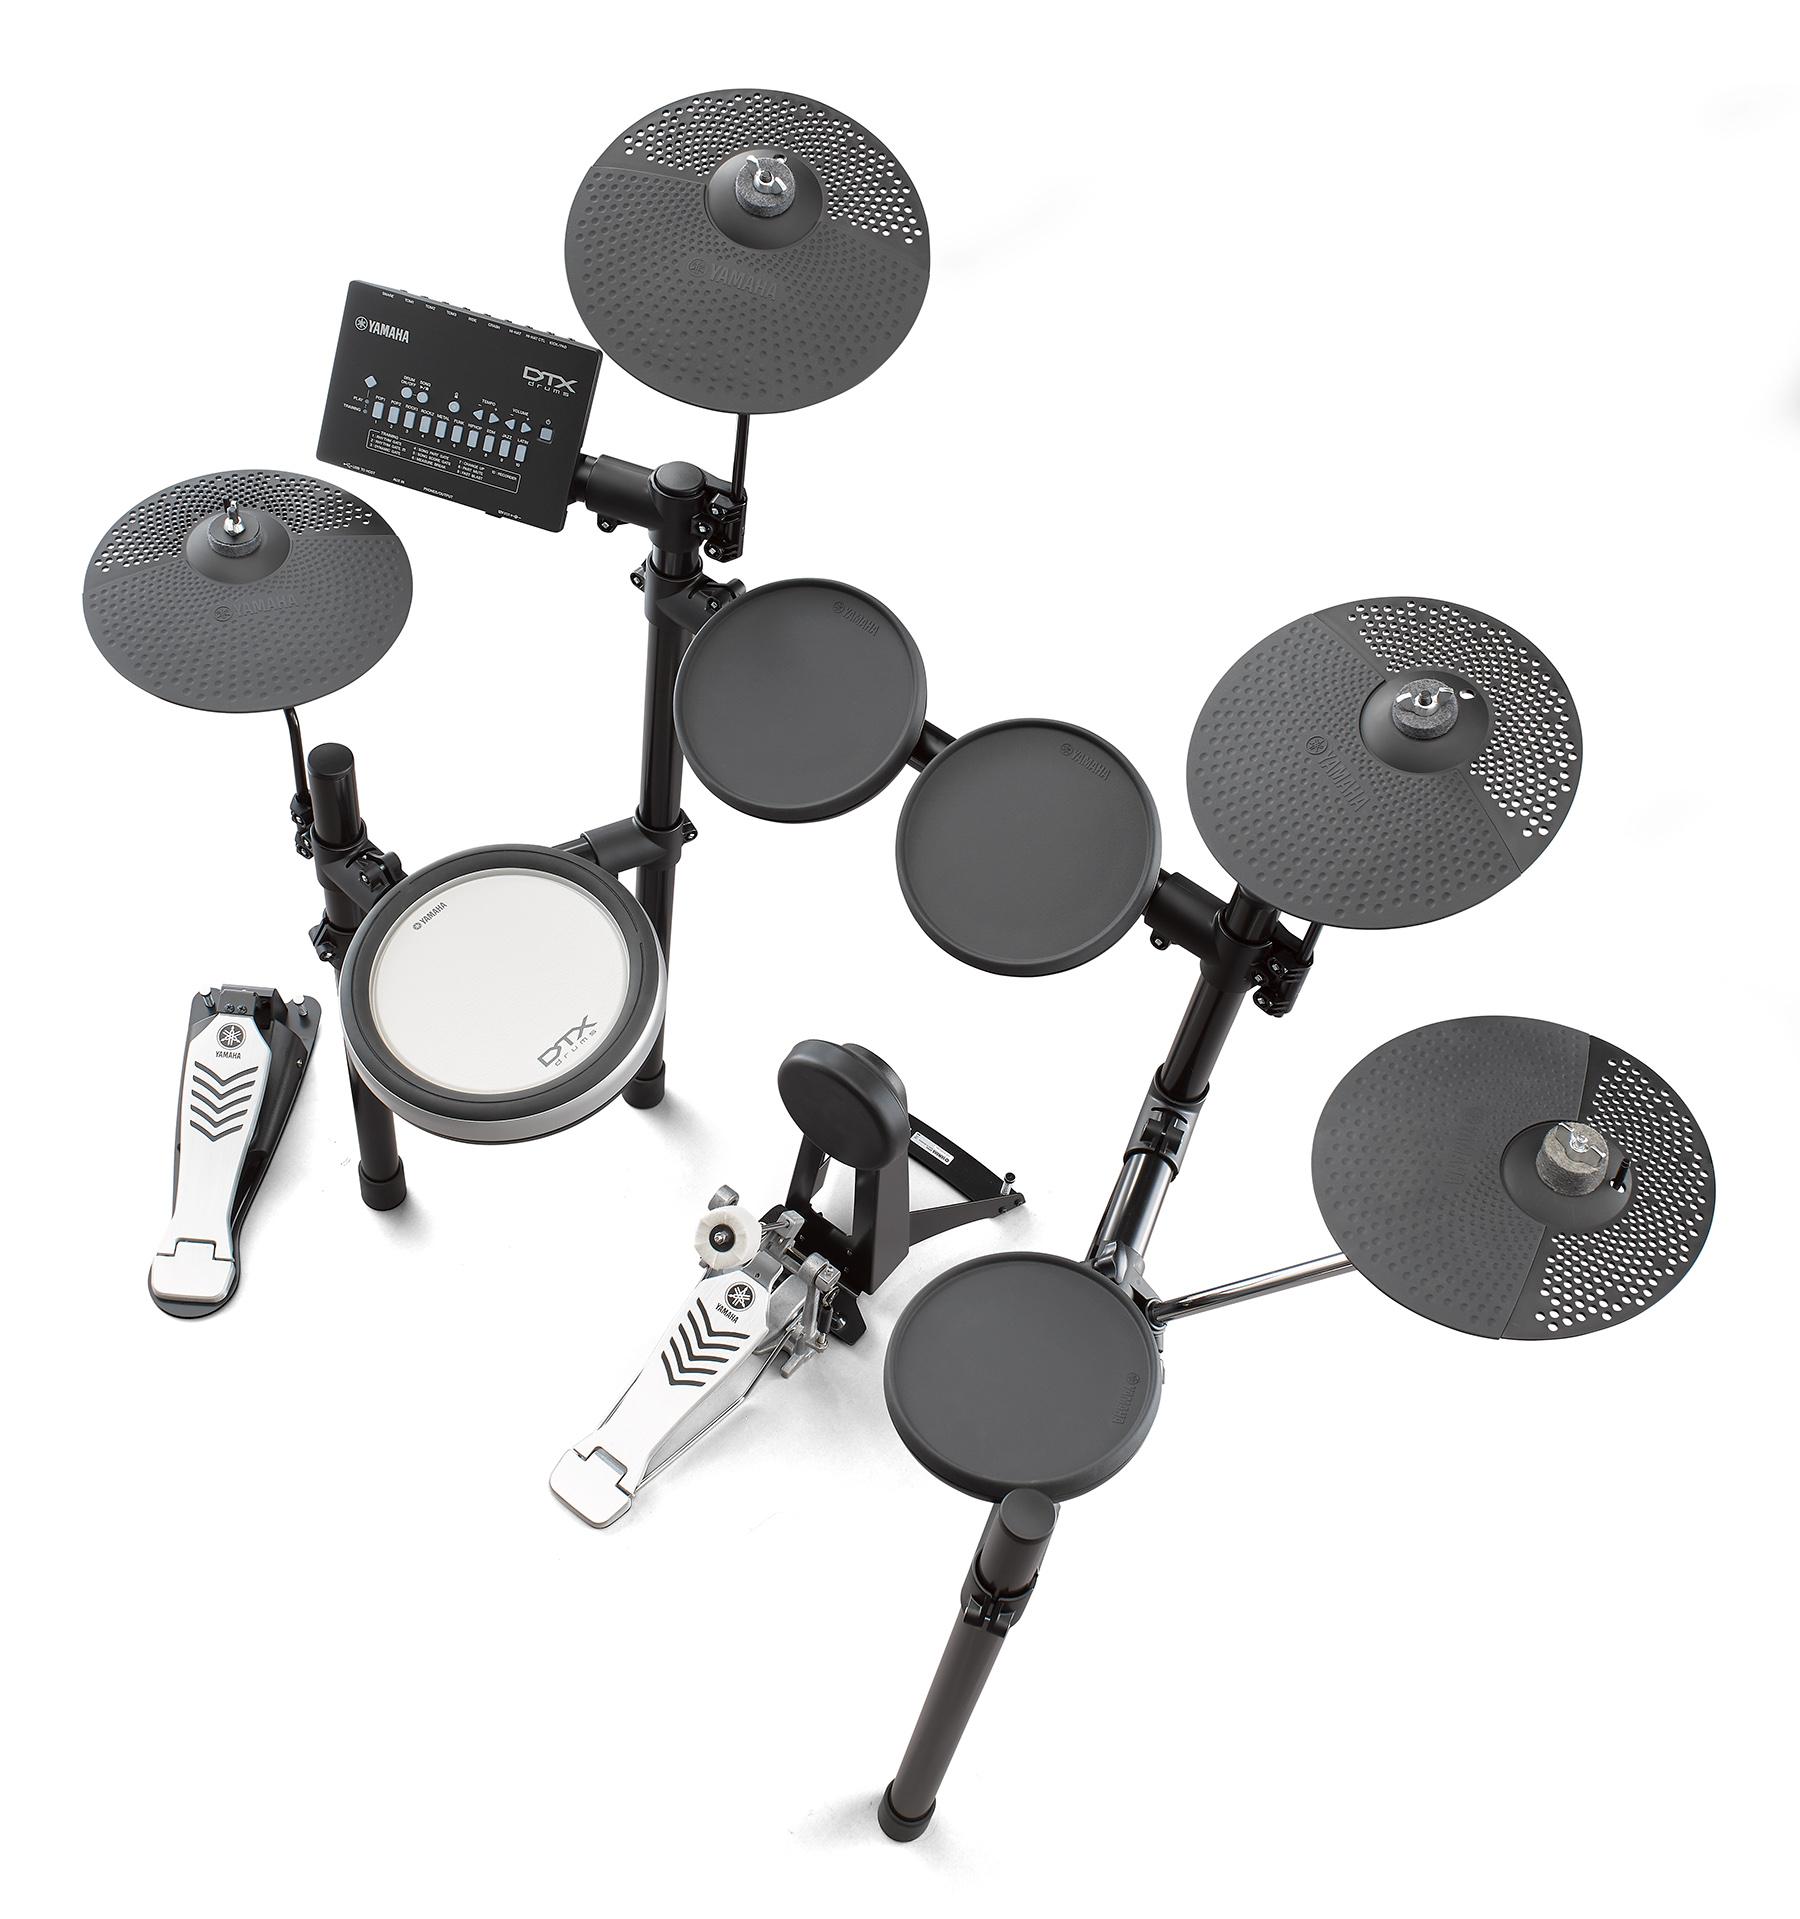 News: Yamaha ergänzt E-Drum Serie DTX402 um die Variante DTX482K